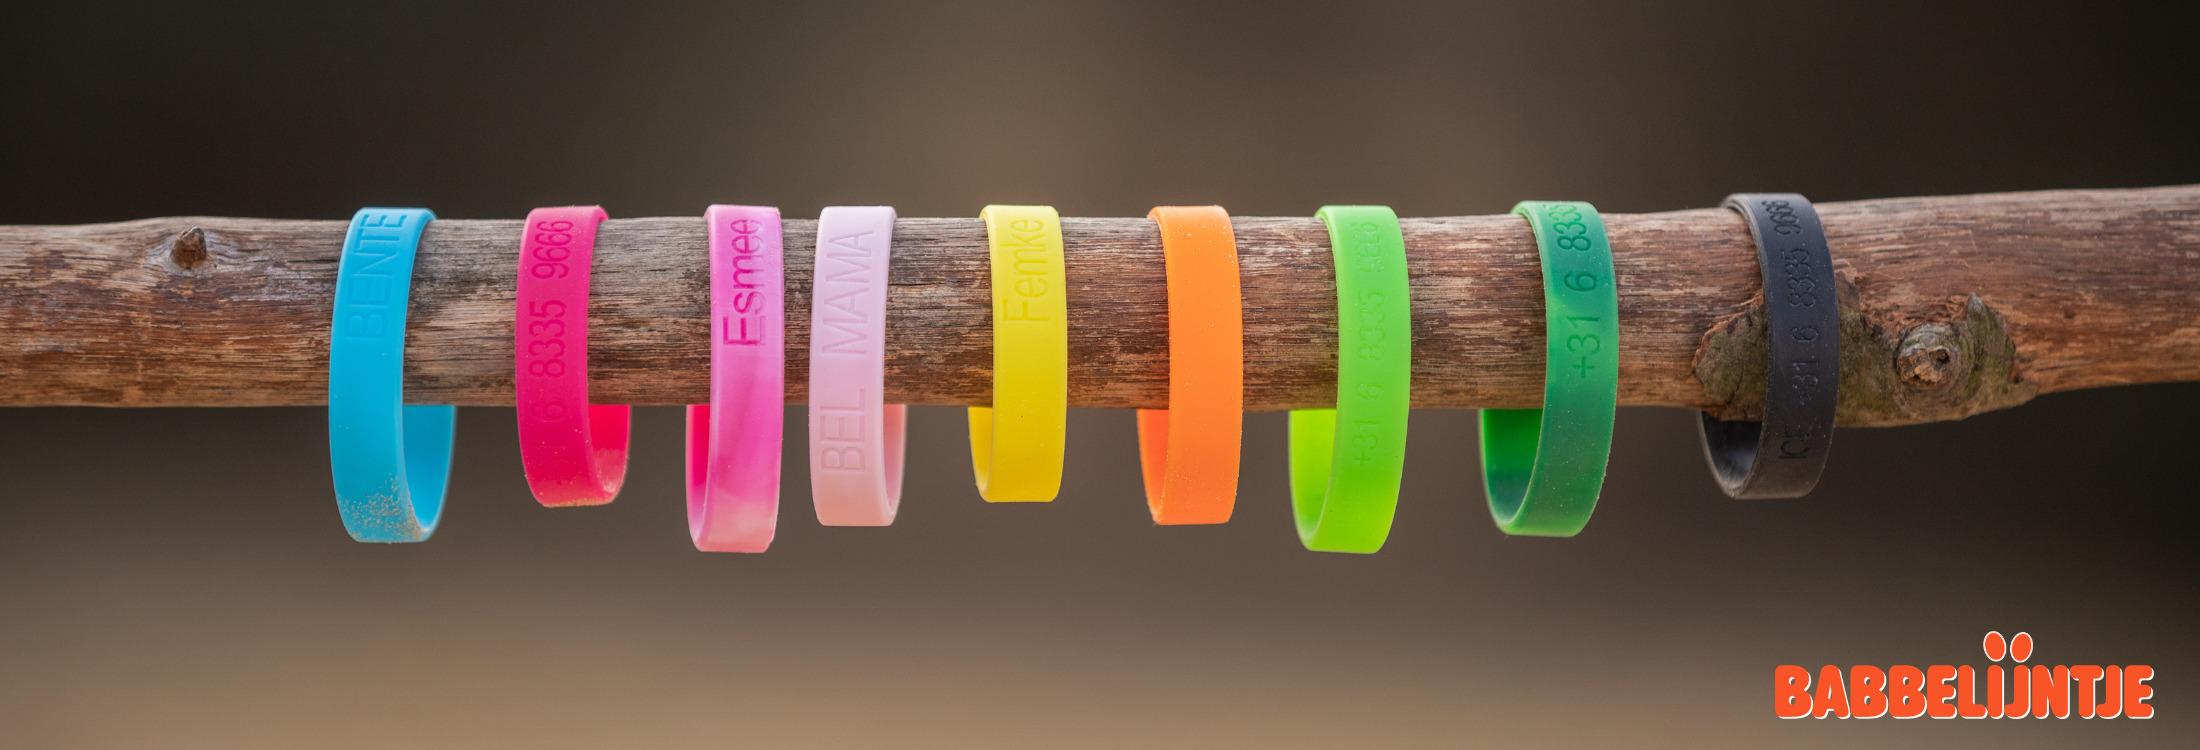 SOS armbandjes